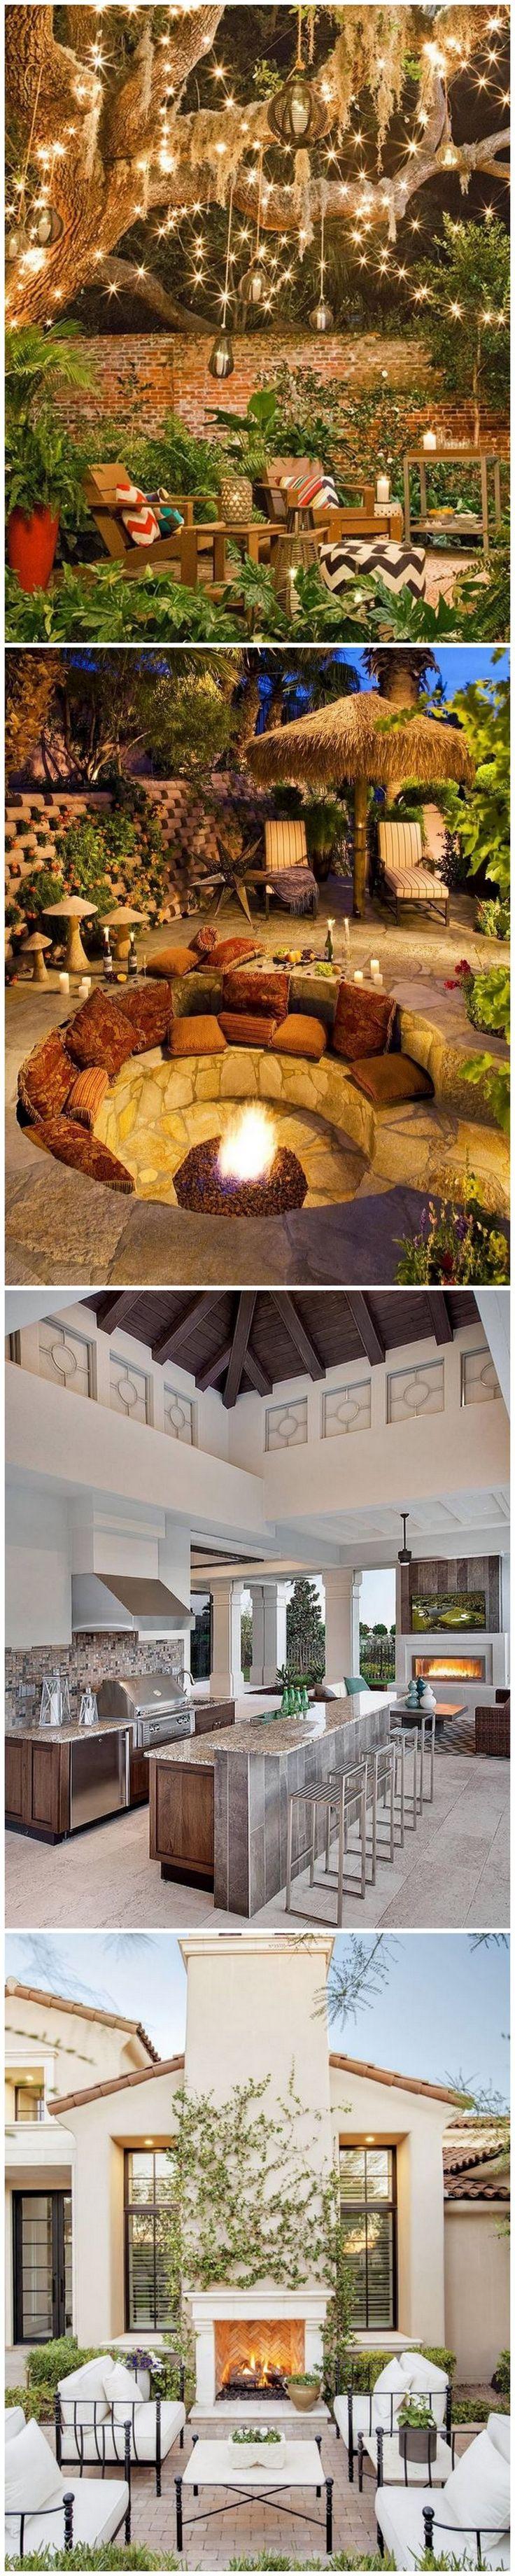 Outdoor Living Room Designs best 25+ outdoor living ideas on pinterest | back yard, backyards